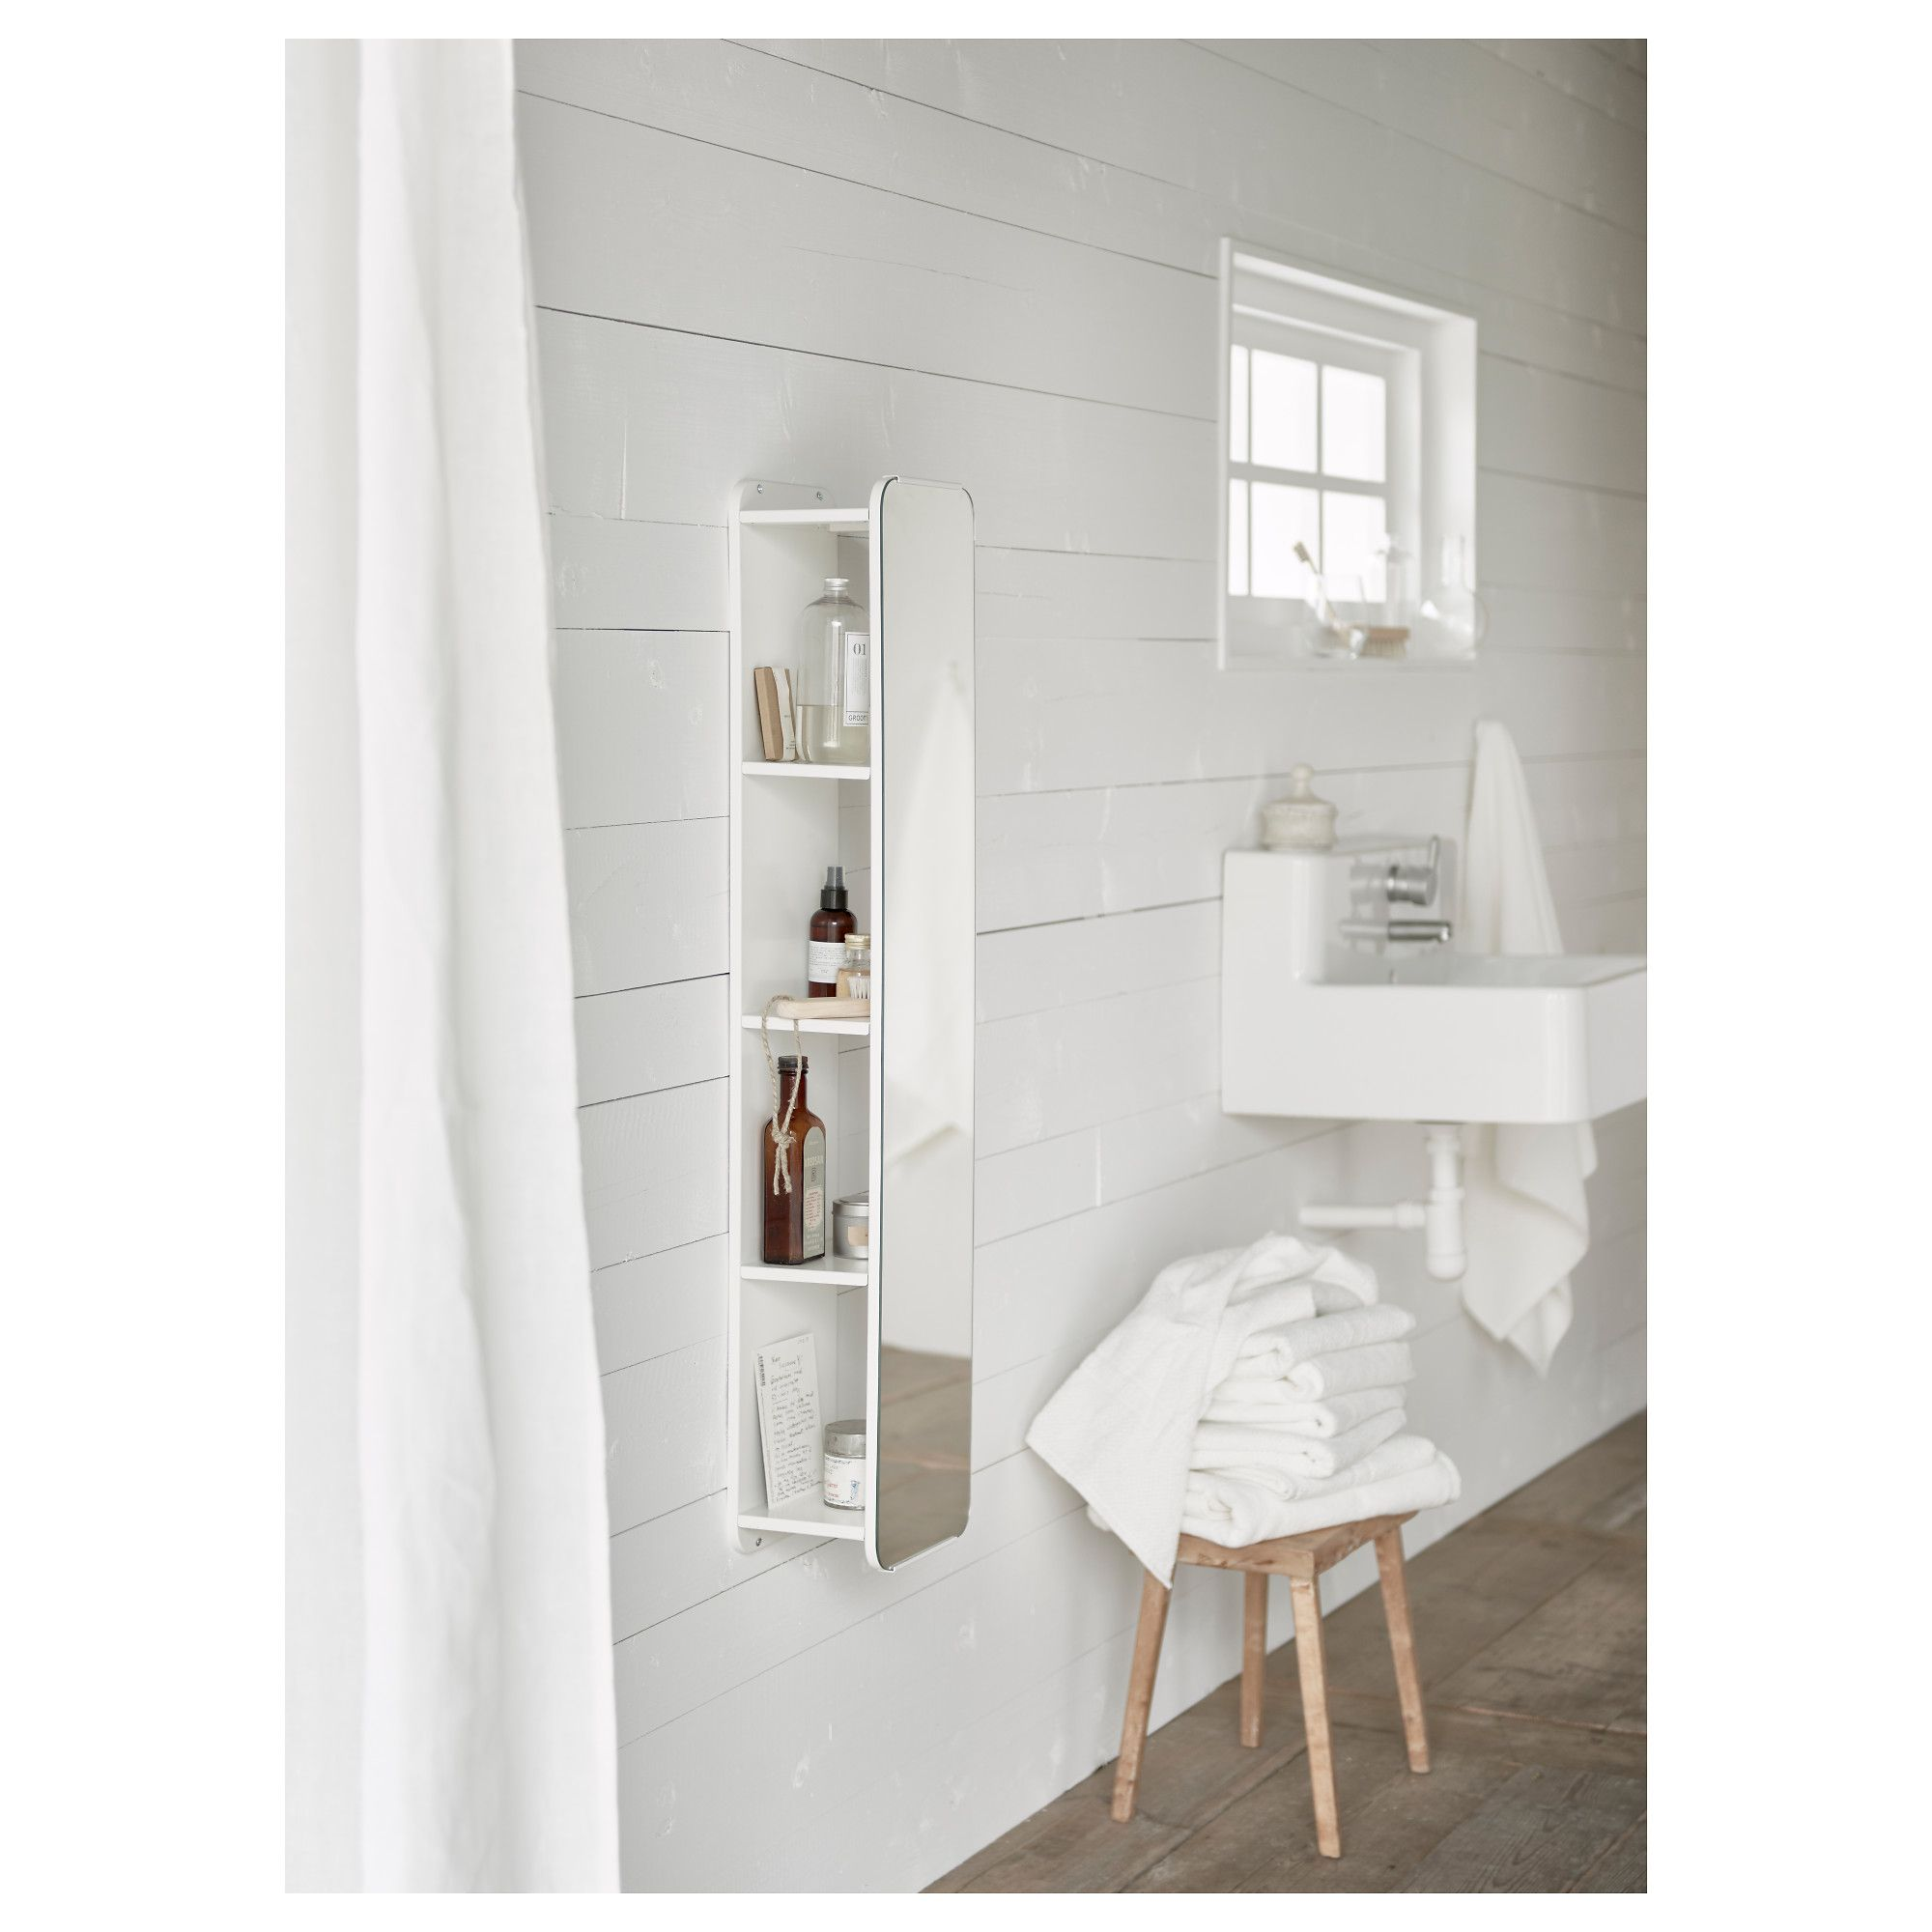 BRICKAN Mirror with storage unit White 20x100 cm | Storage, Wall ...